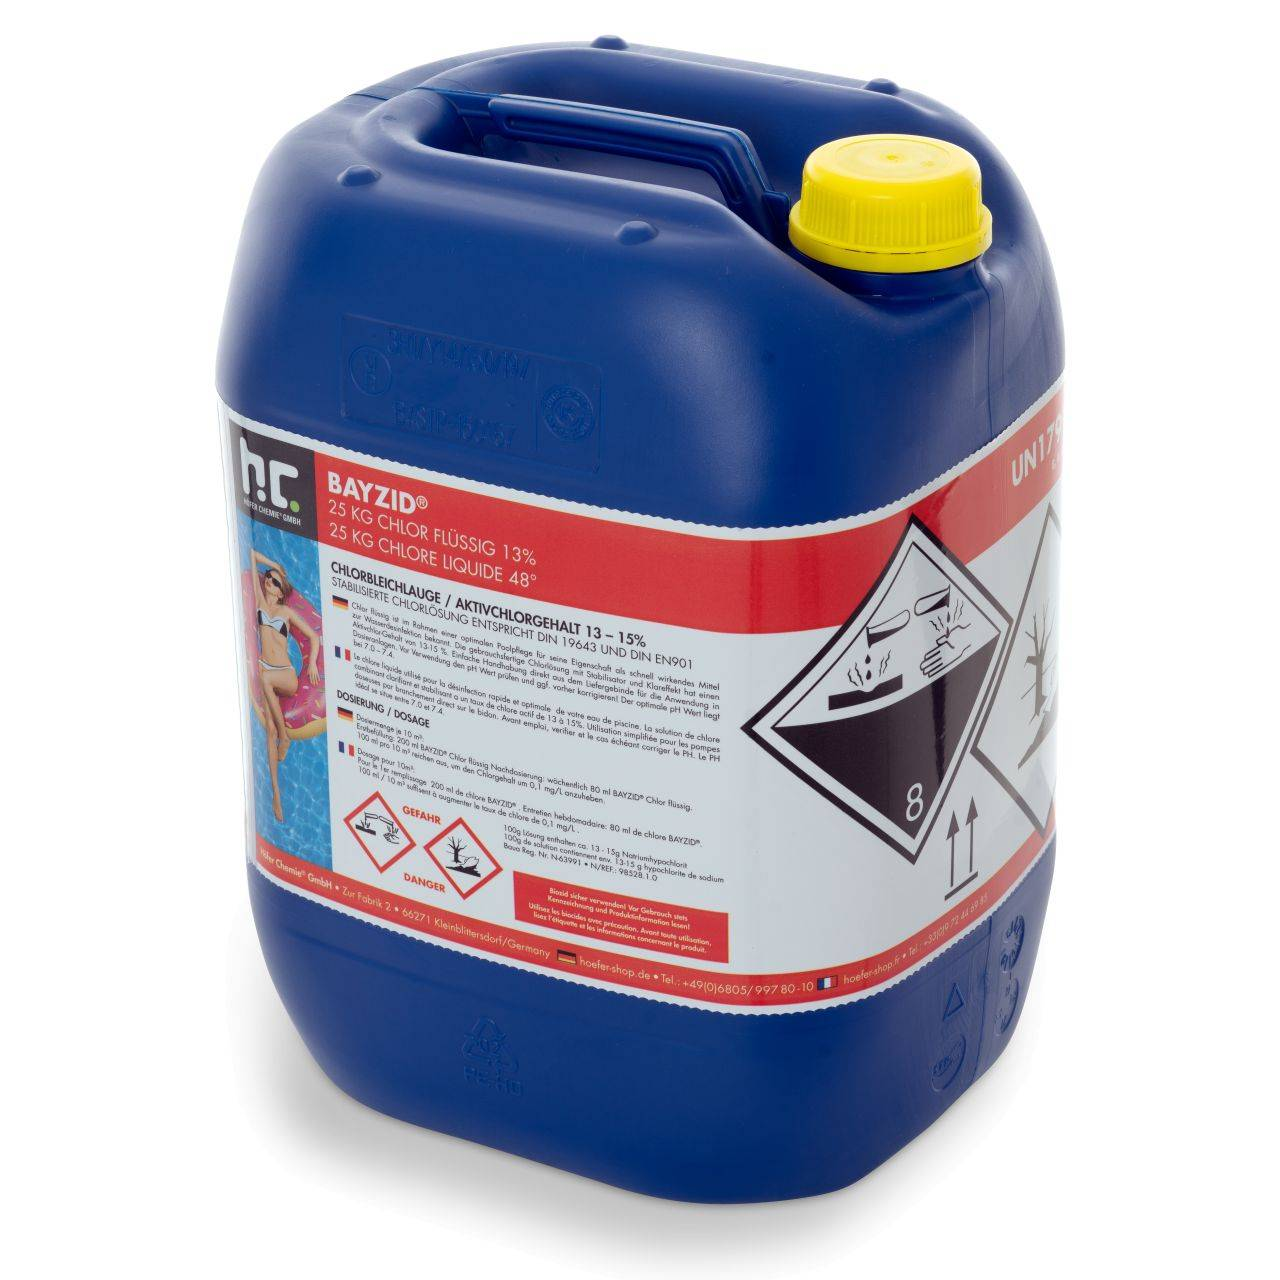 BAYZID 100 kg 20 L) Bayzid® Chlore liquide 48° (4 x 25 kg)